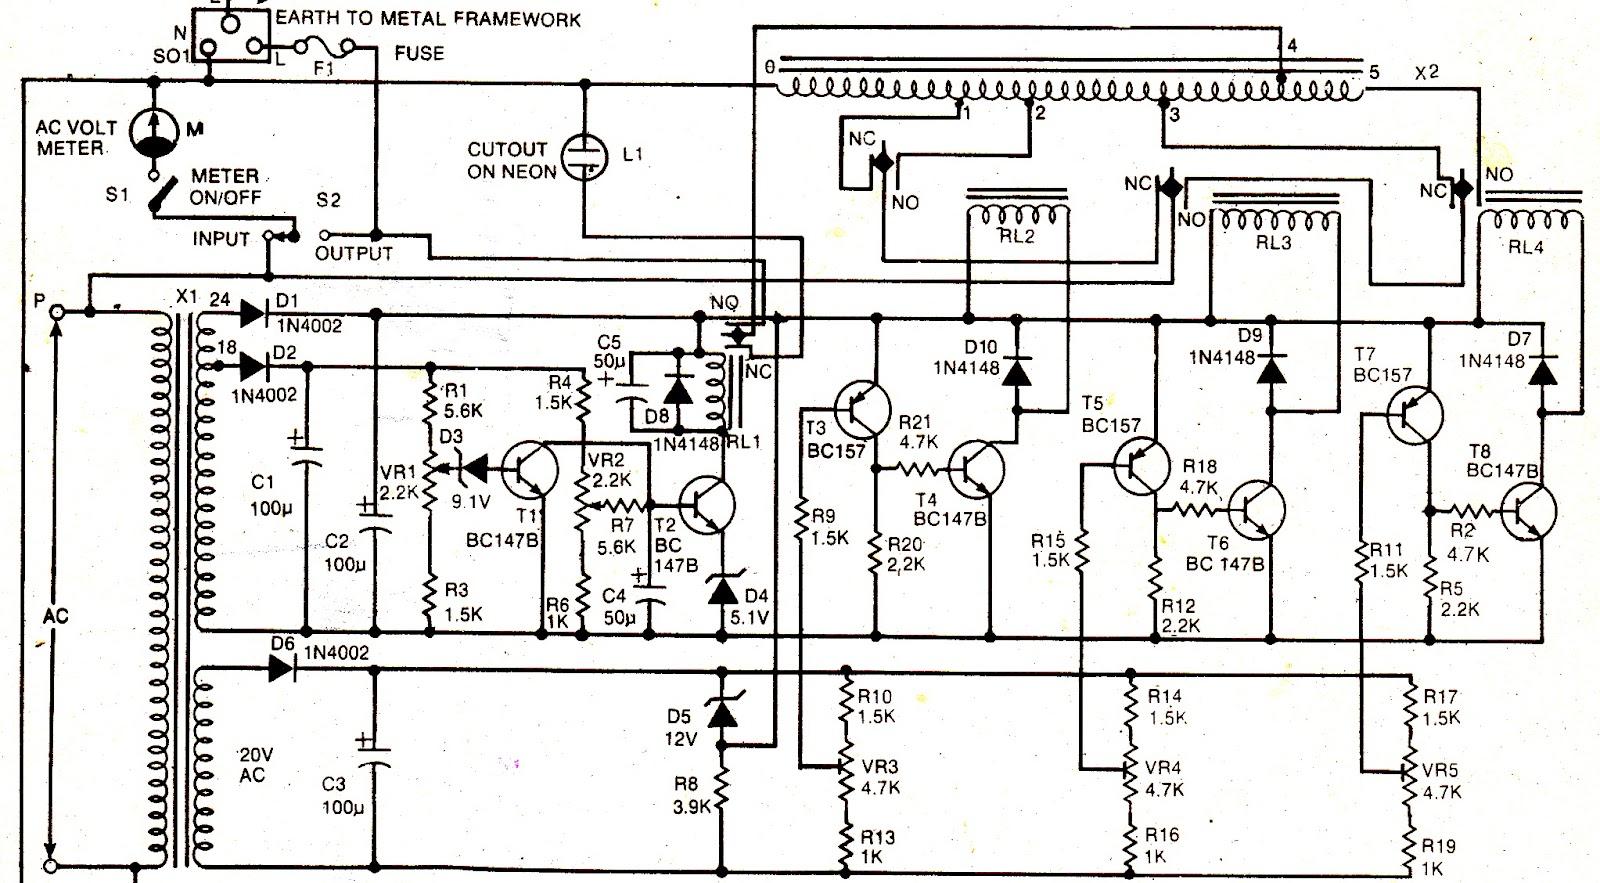 Voltage Stabilizer For Air Conditioner V Guard | grihon.com AC ... on distributor wiring, tachometer wiring, switch wiring, fuel pump wiring, air conditioner wiring, contactor wiring, gauge wiring,